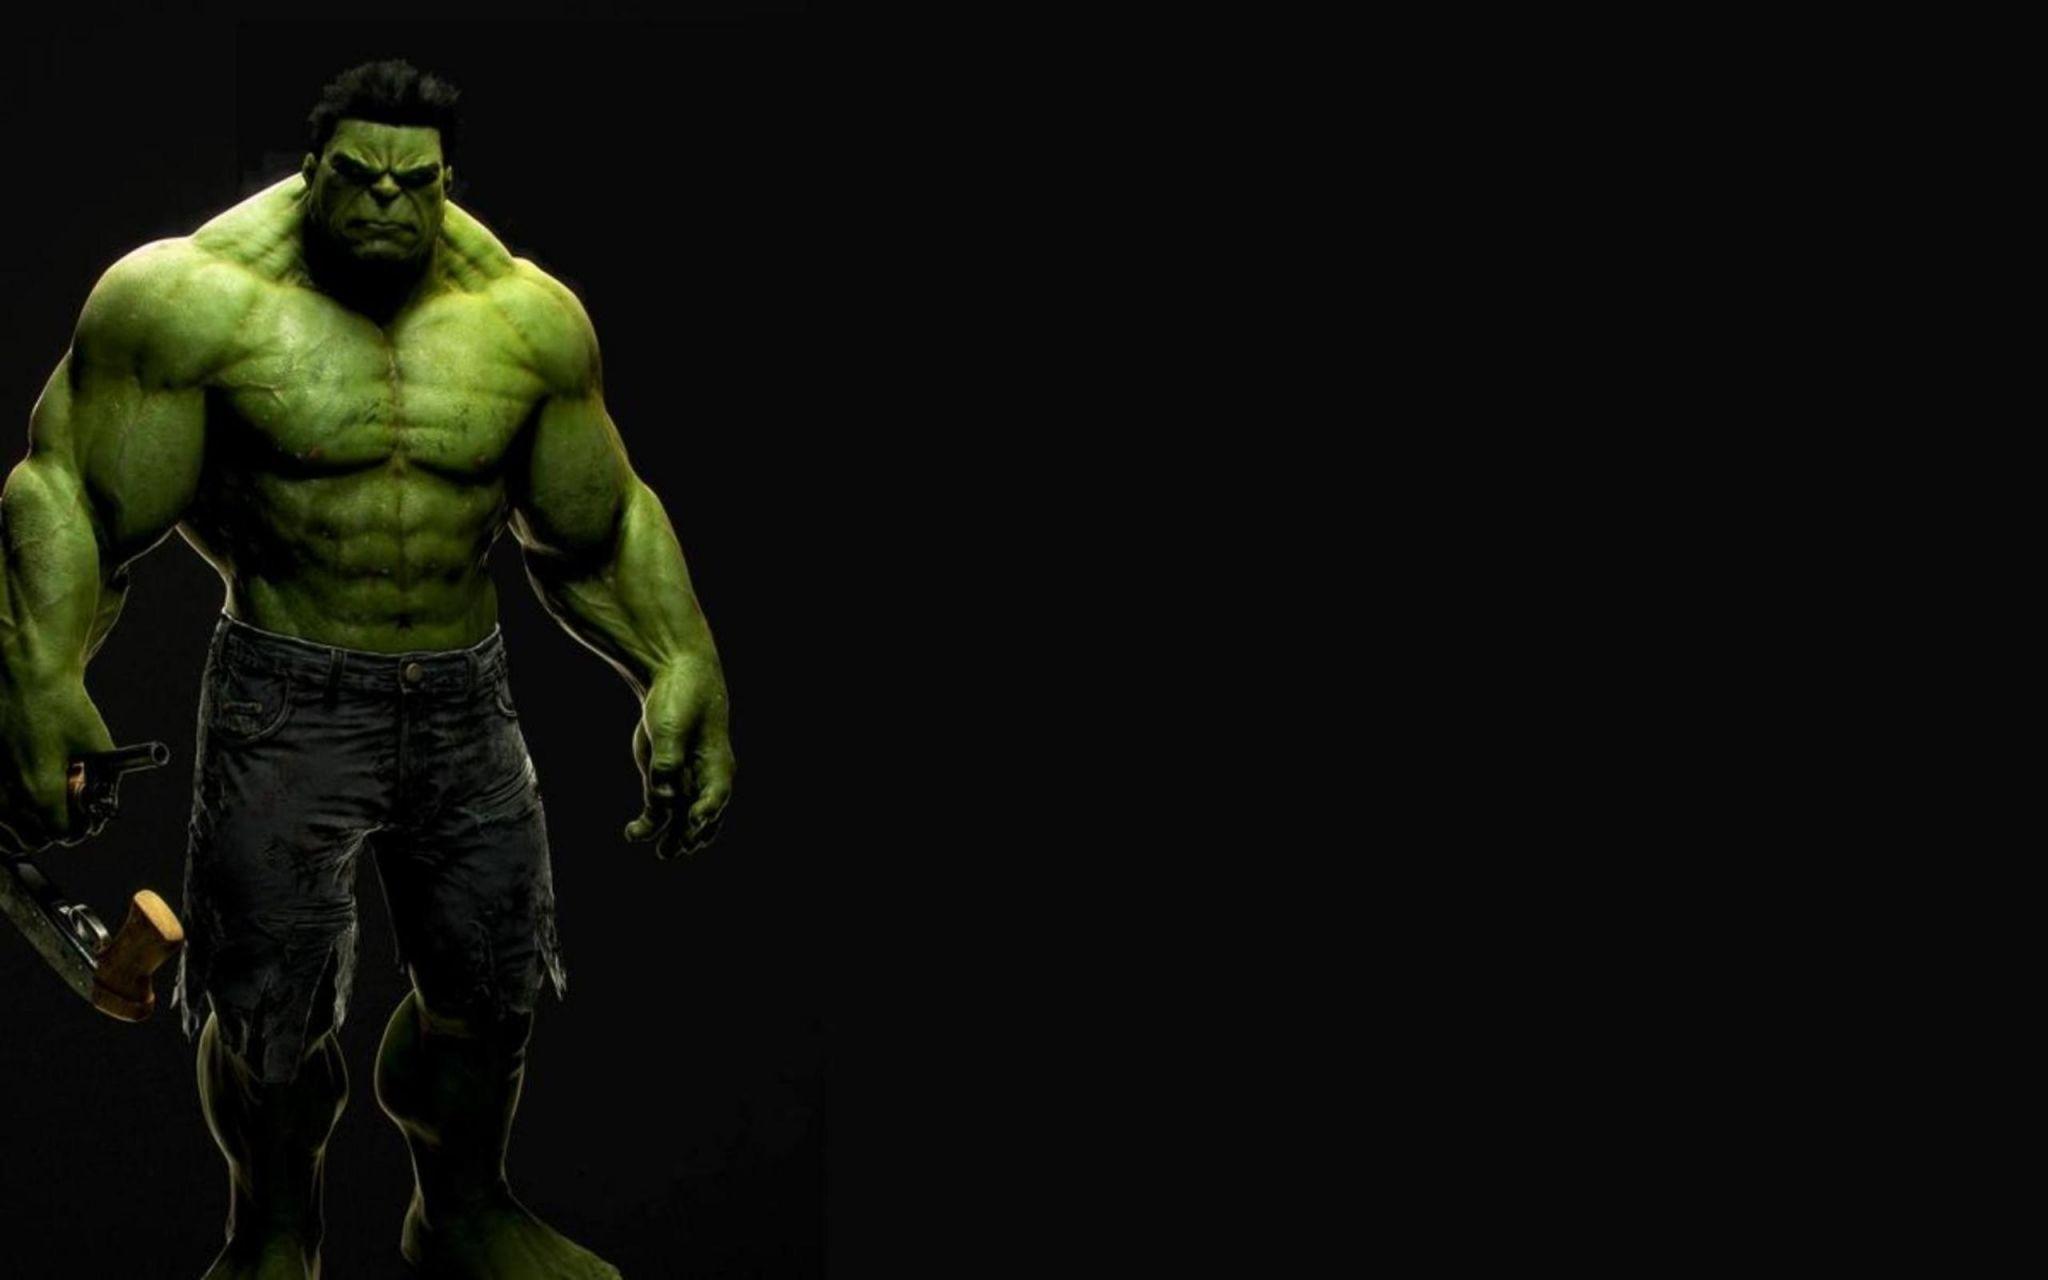 Hulk Widescreen Desktop Wallpaper Avengers Wallpaper Hulk Marvel Hulk